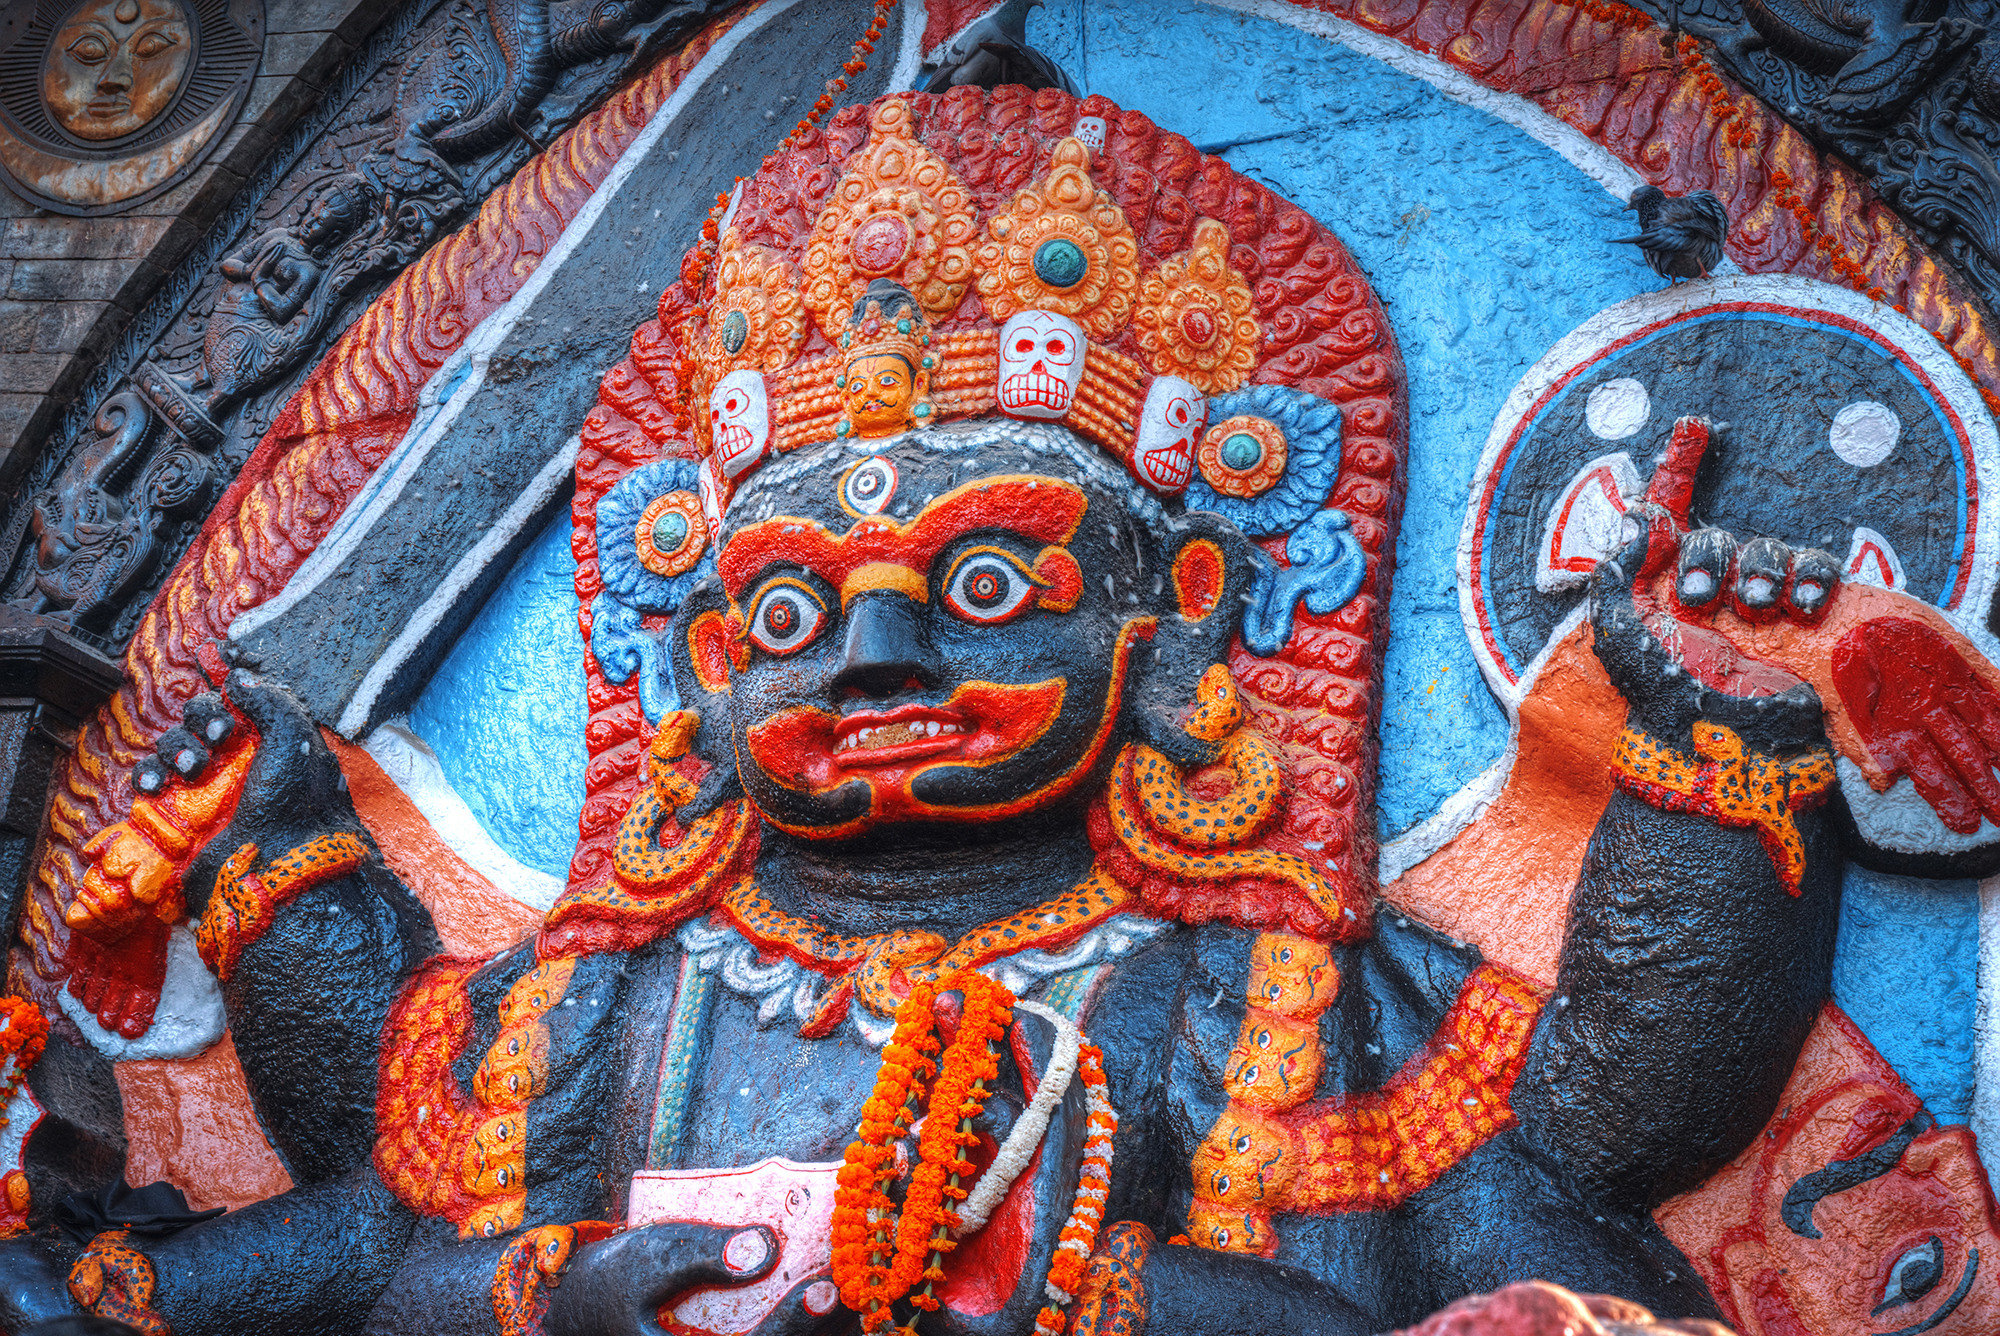 nepal_bigstock-Kali-Statue-In-Kathmandu-166371164_resize.jpg